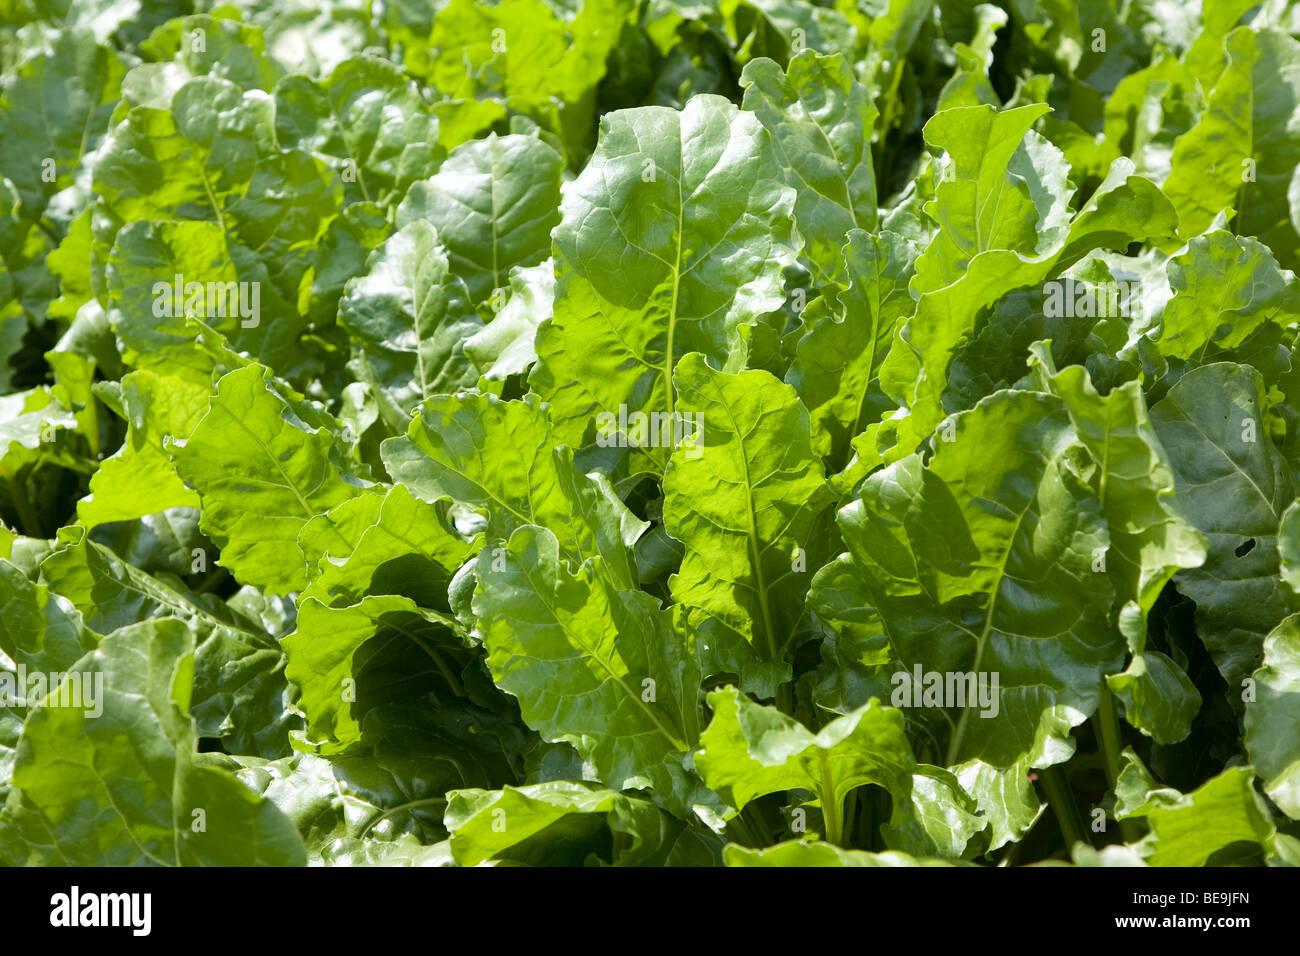 Sugar beet leaves - Stock Image